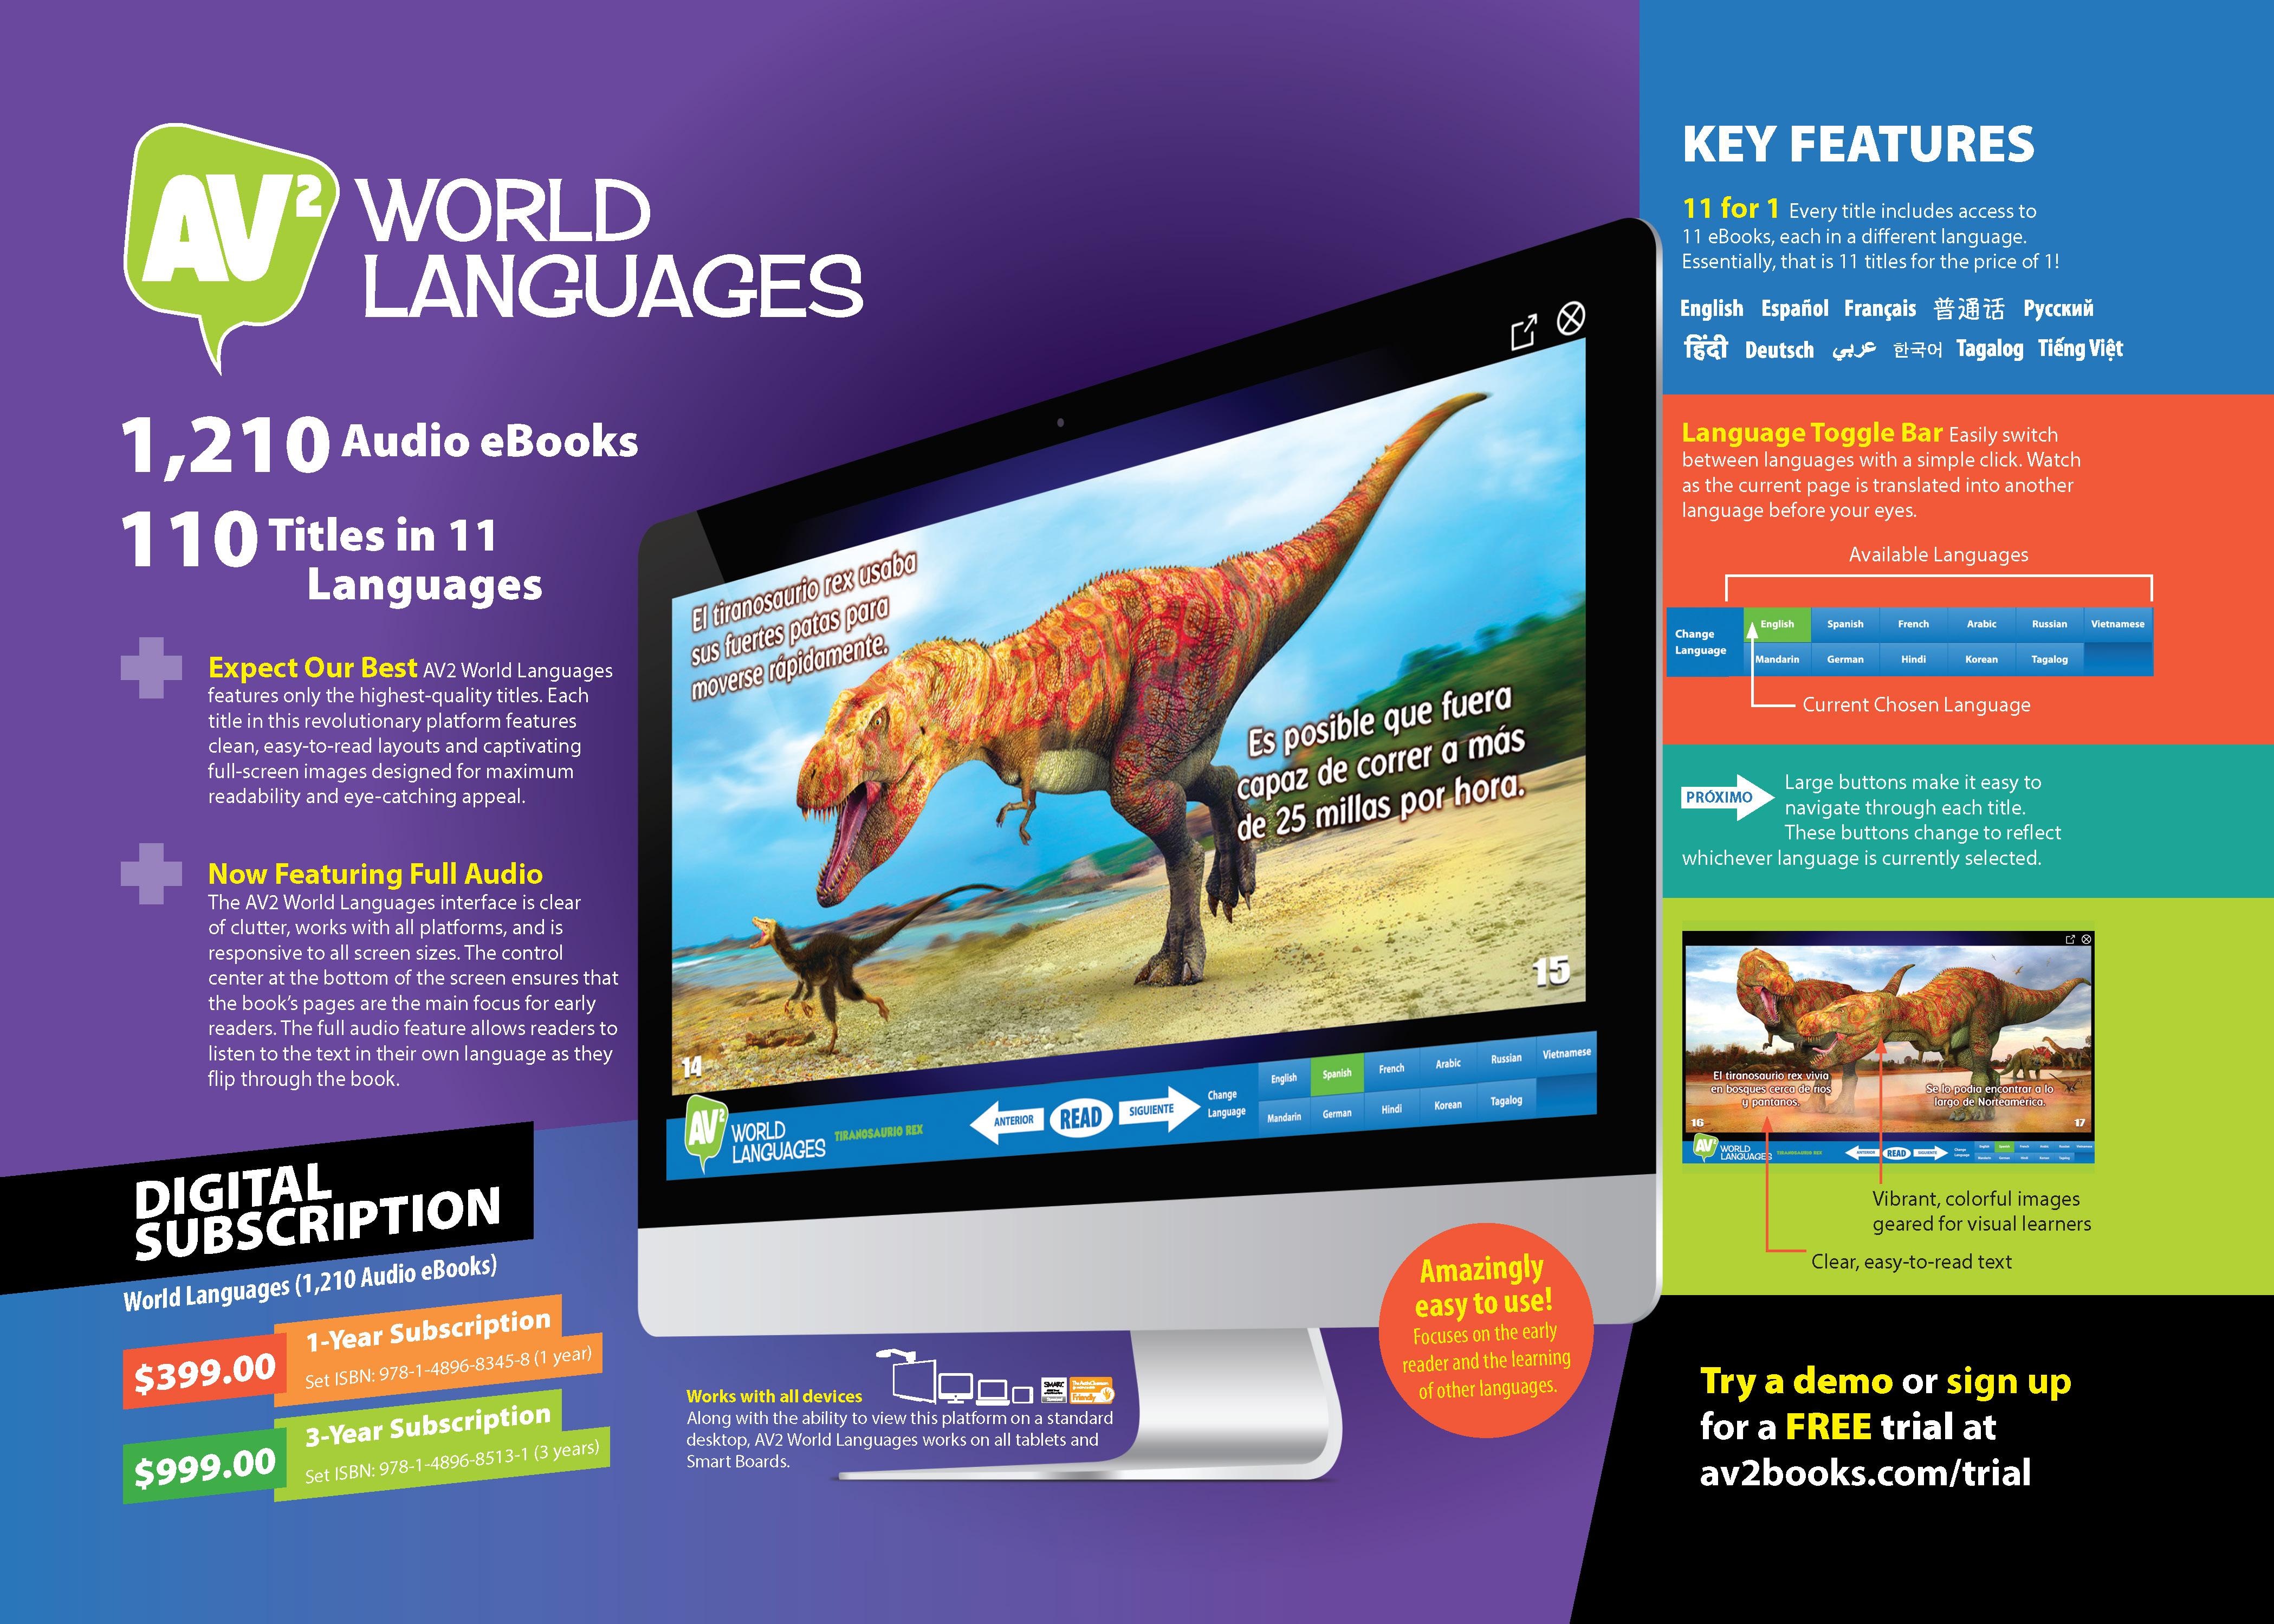 AV2-world-languages